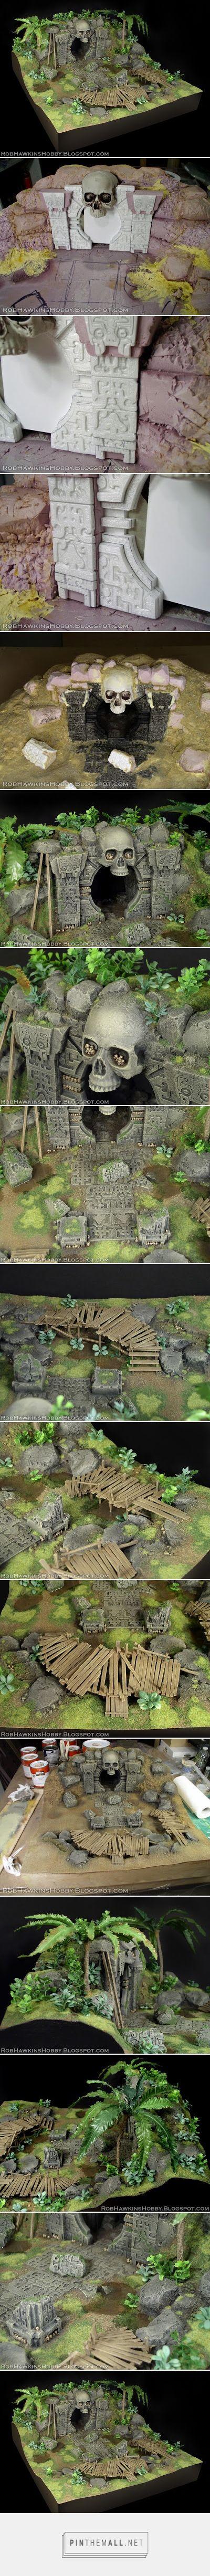 Rob Hawkins Hobby: Conan Terrain: Jungle Temple - created via http://pinthemall.net